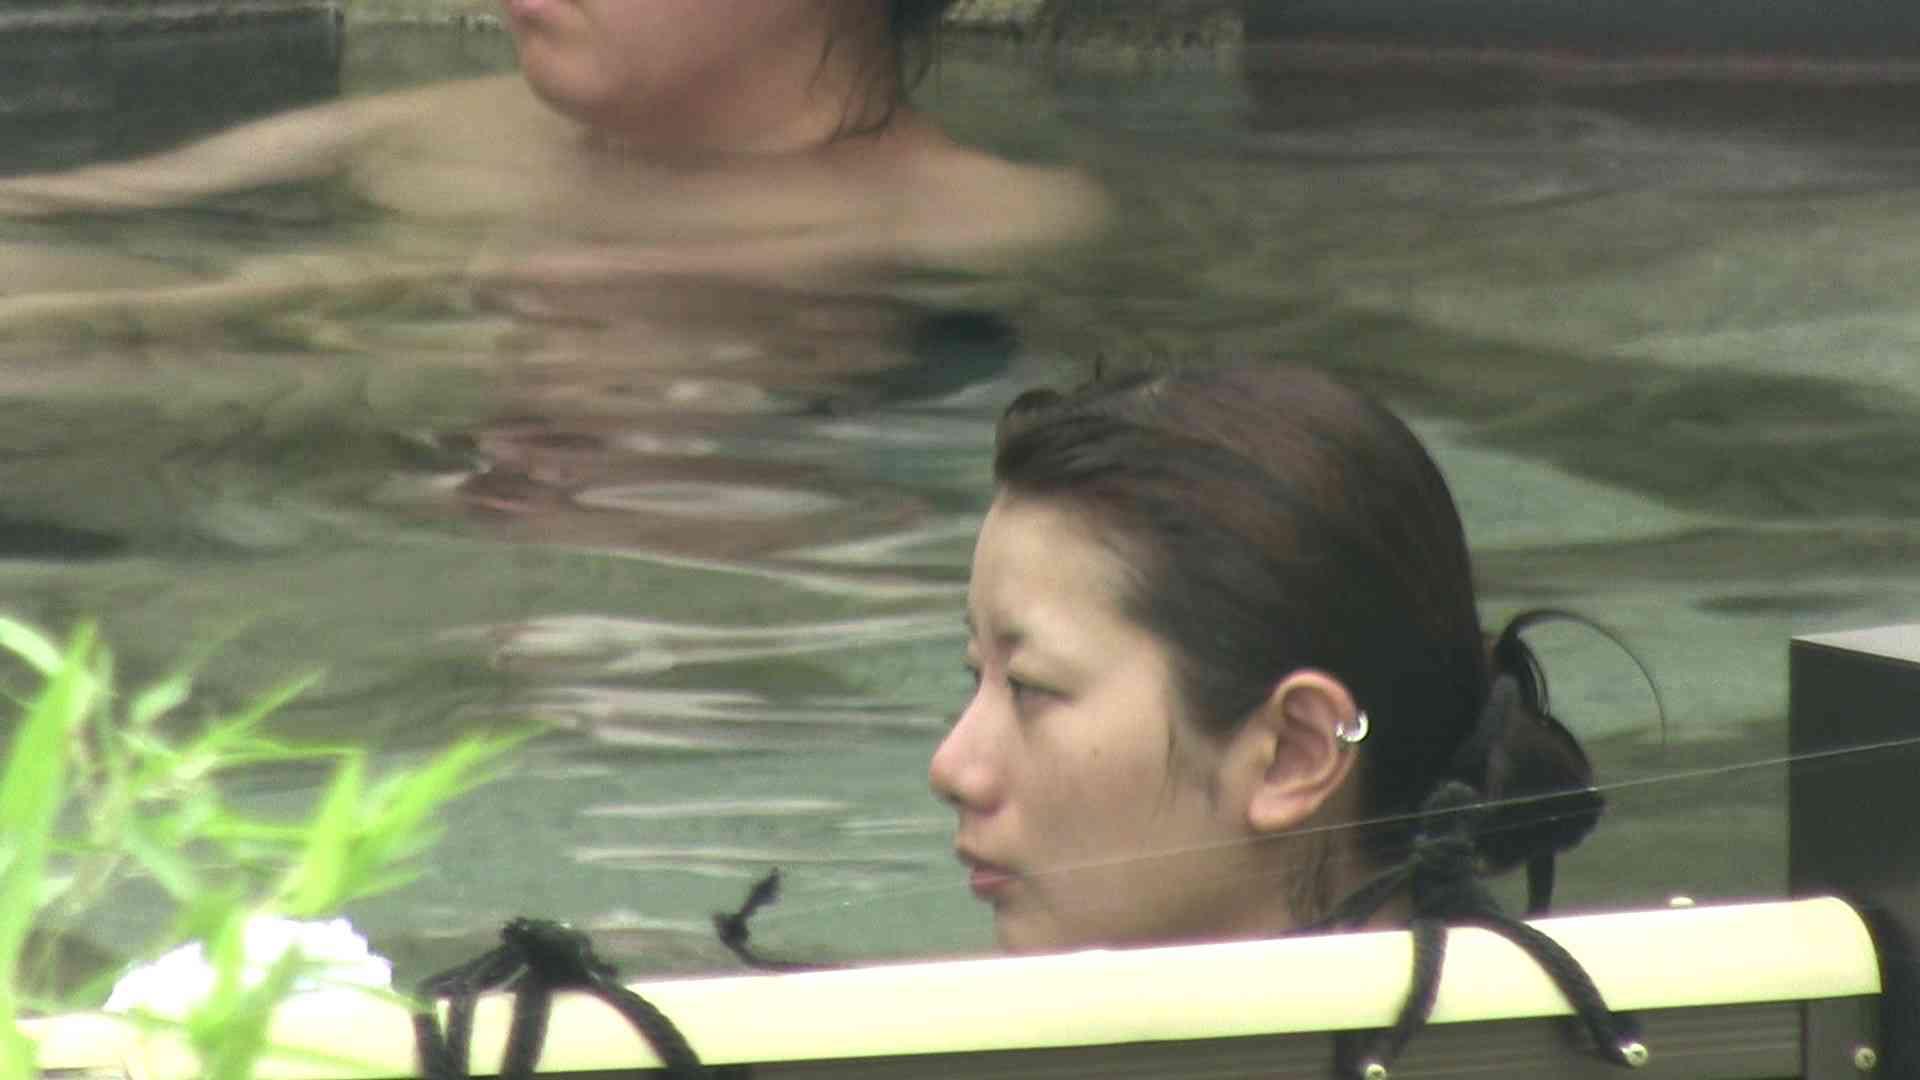 Aquaな露天風呂Vol.19【VIP】 盗撮 | HなOL  88pic 78